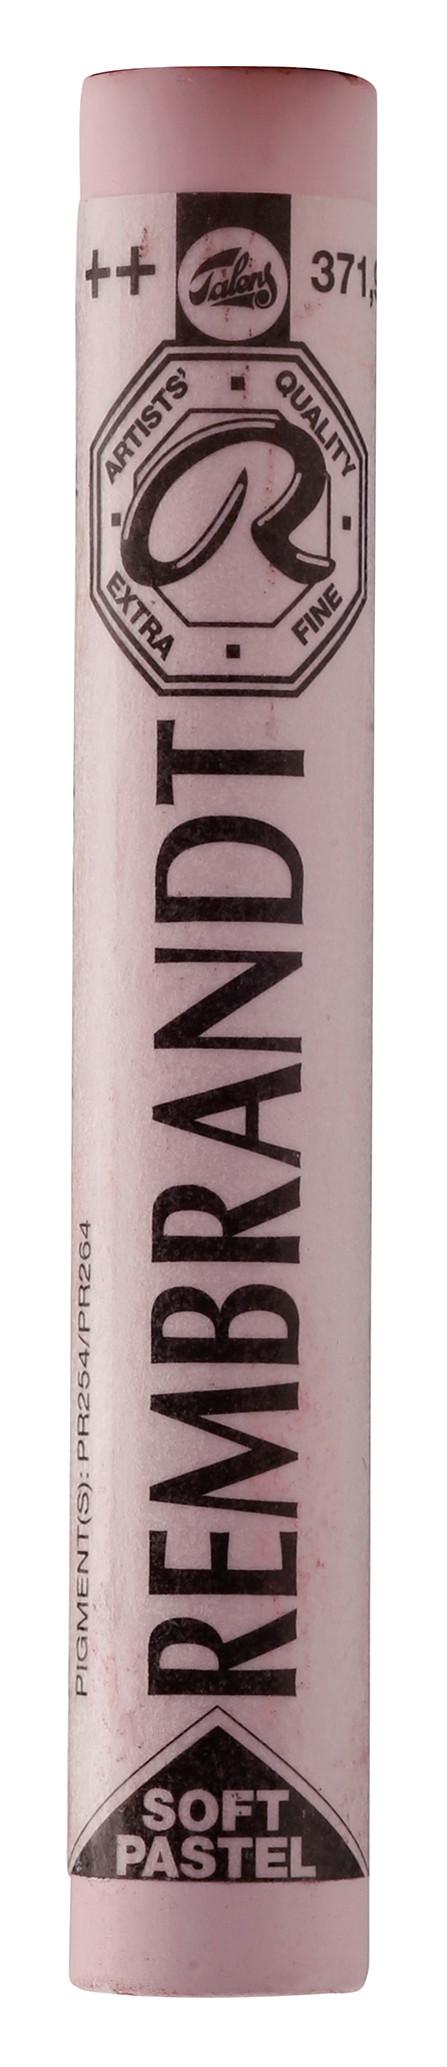 Rembrandt Soft Pastel Round Full Stick Permanent Red Deep(9) (371.9)